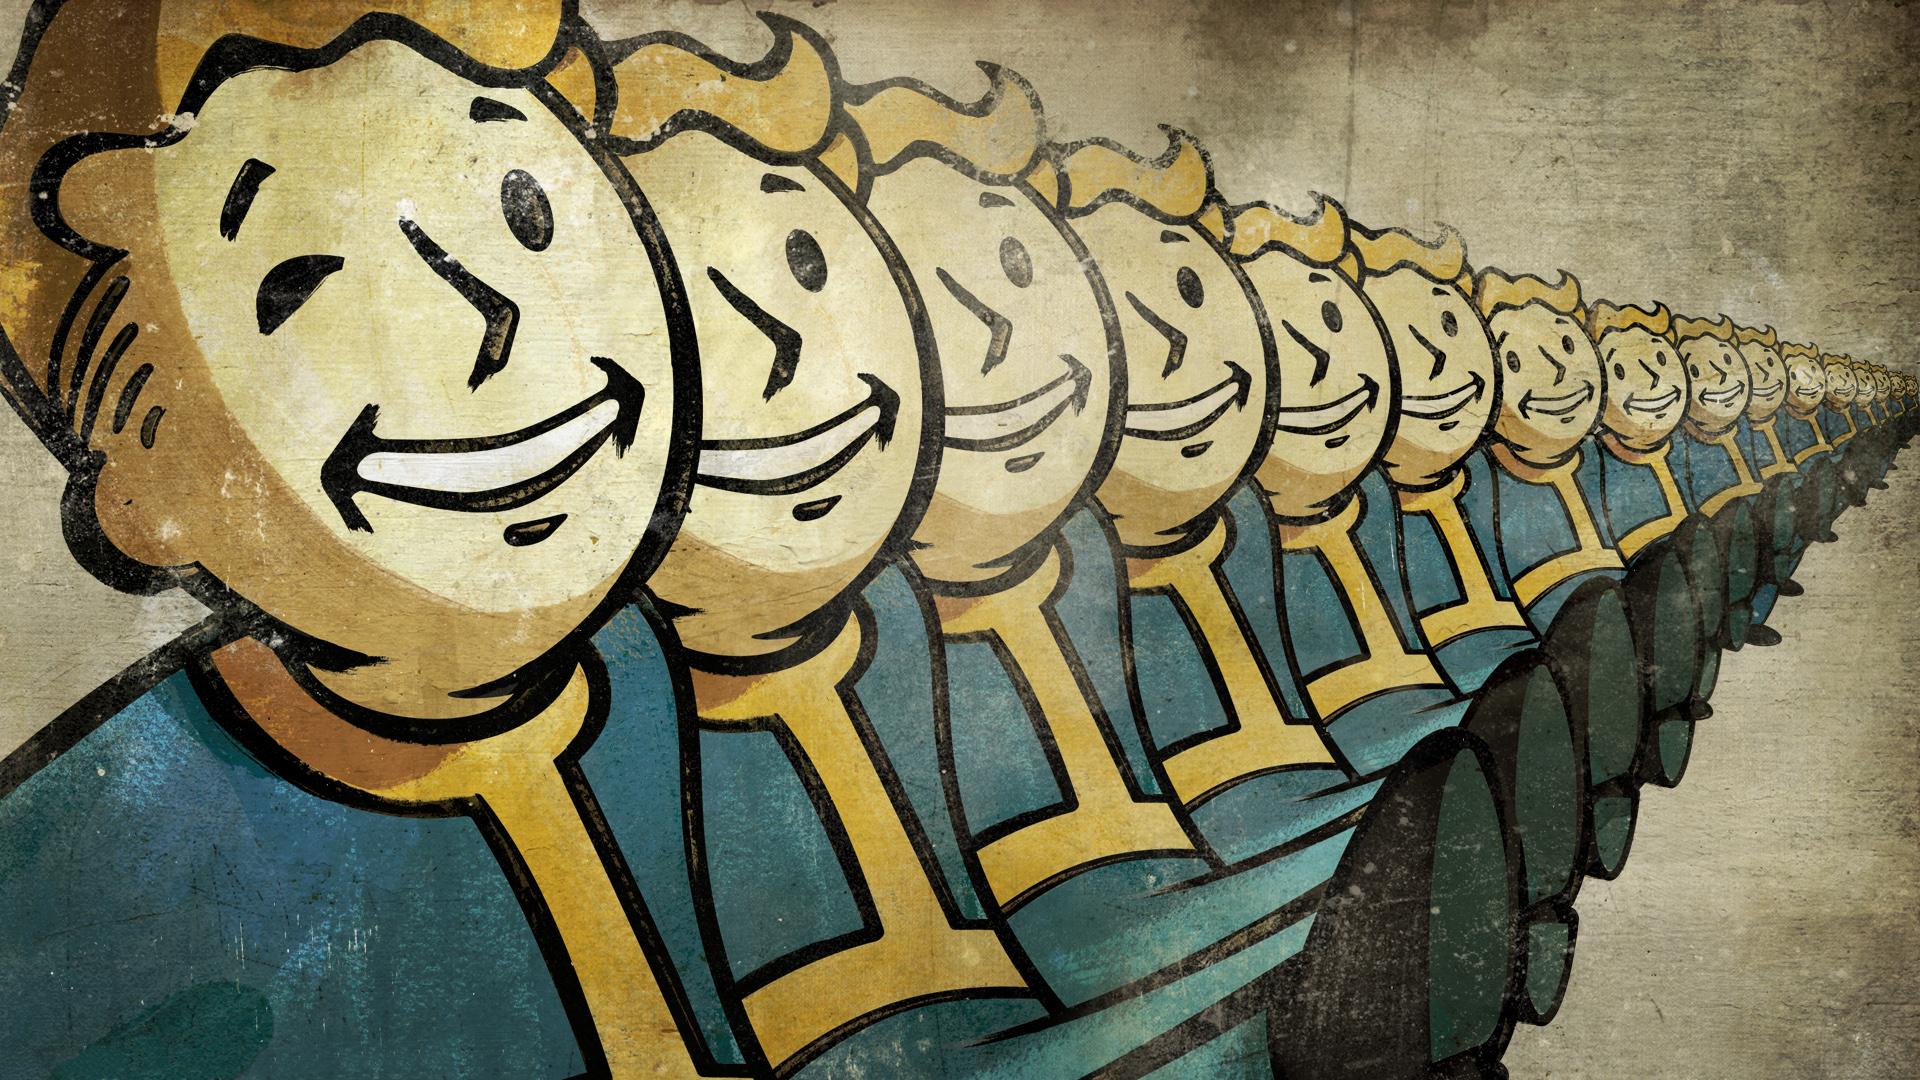 Создатель Planescape: Torment намекнул на новую Fallout